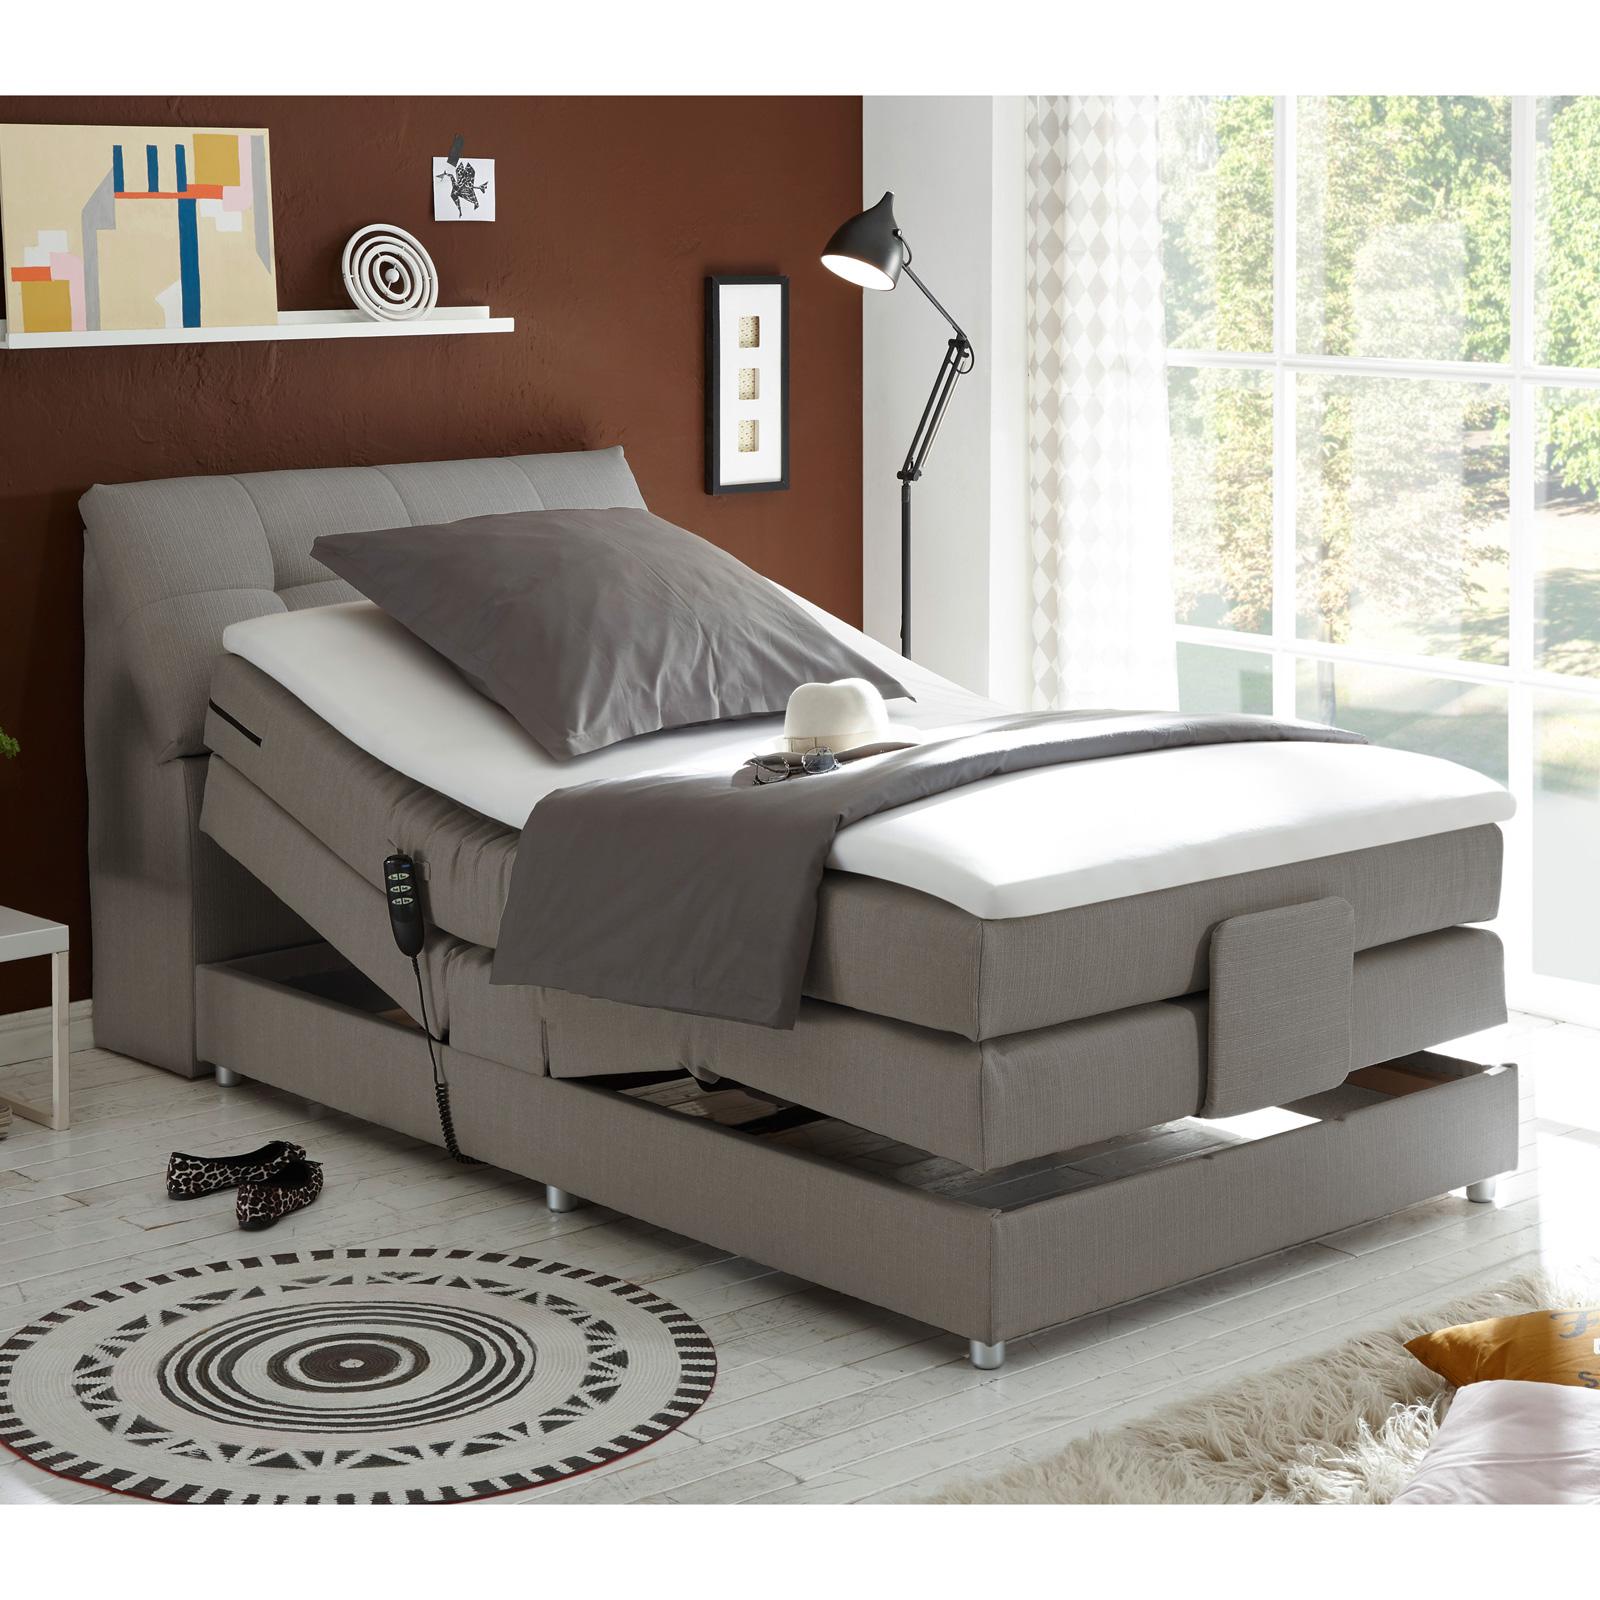 boxspringbett concort bett stoff komfortbett mit motor und topper120x200 cm ebay. Black Bedroom Furniture Sets. Home Design Ideas